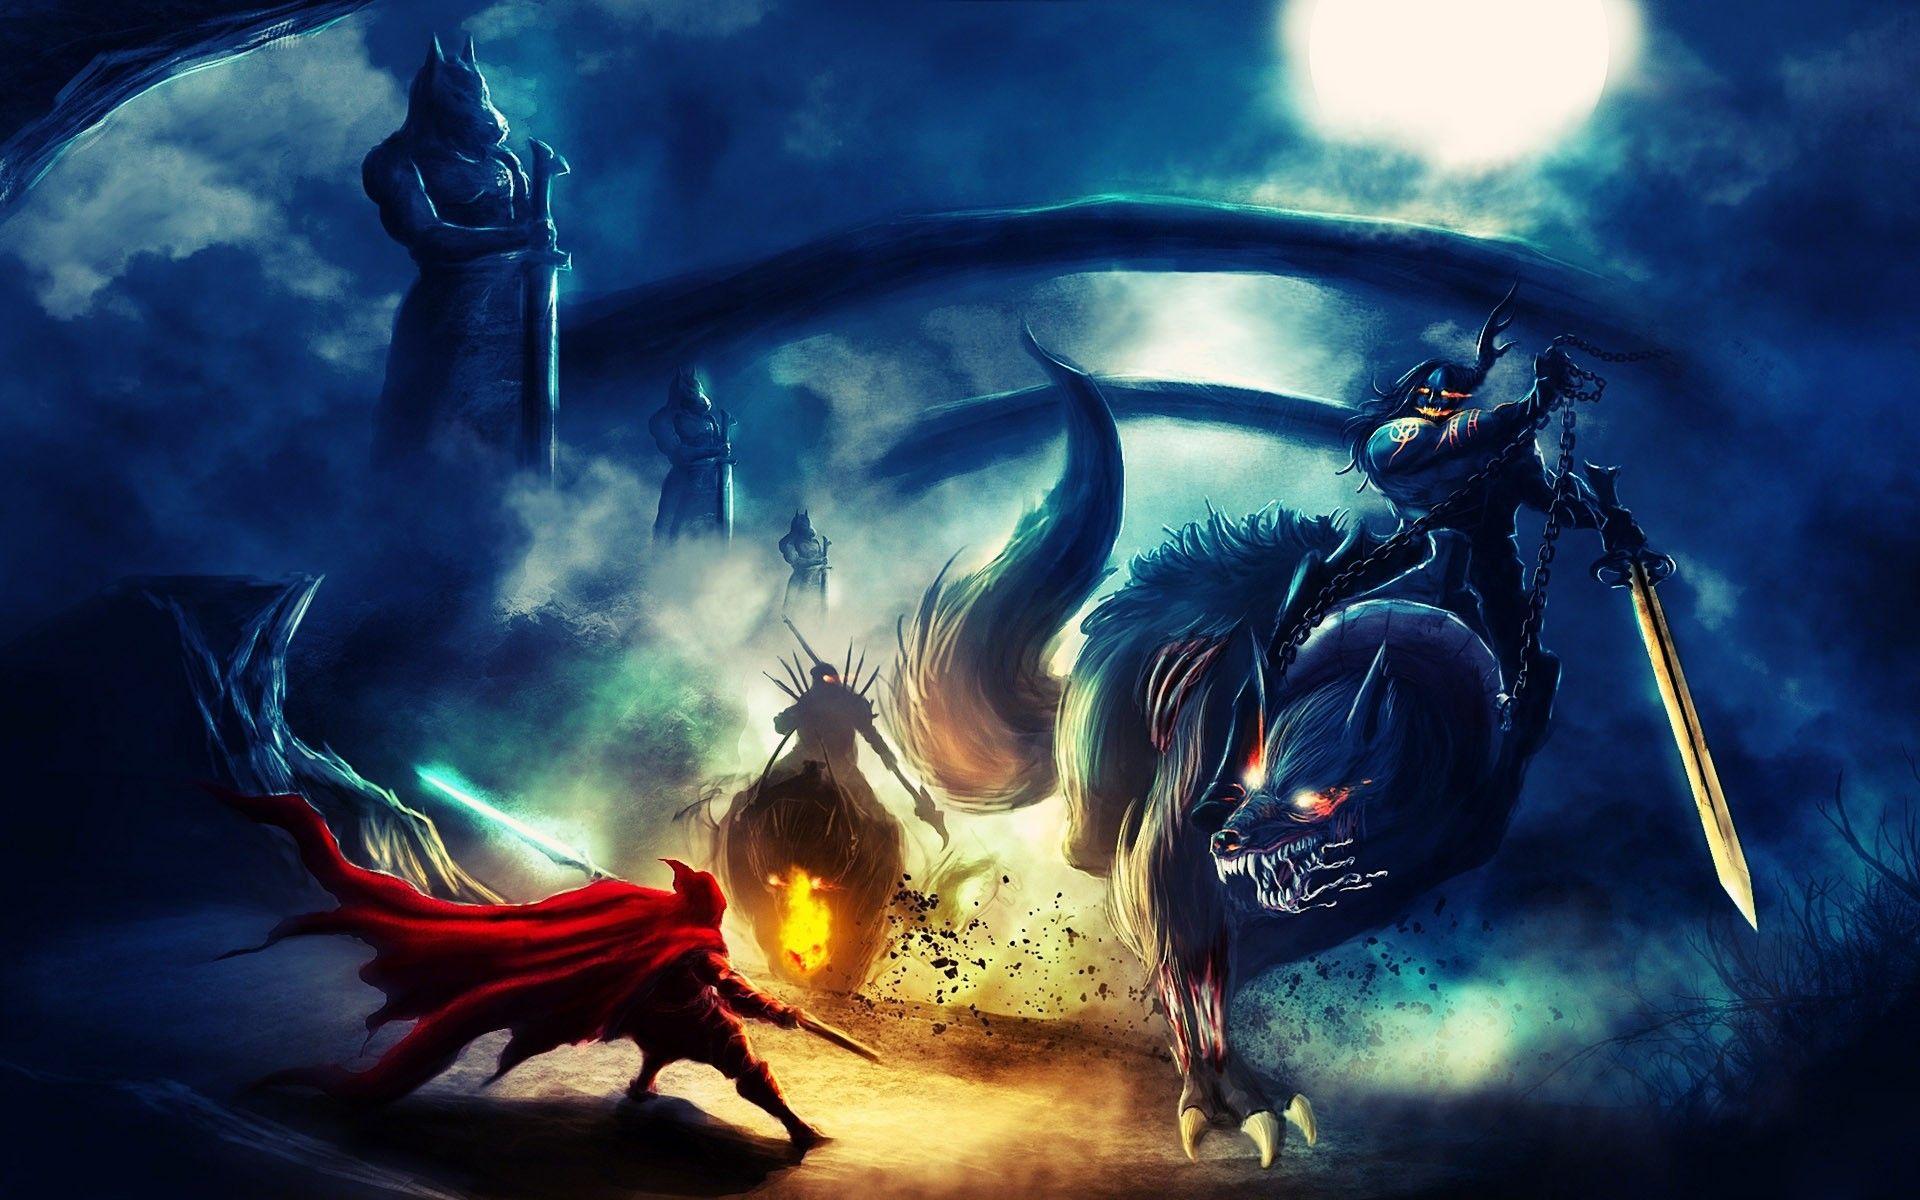 ninja gaiden dragon sword hd wallpapers backgrounds 1920×1200 anime